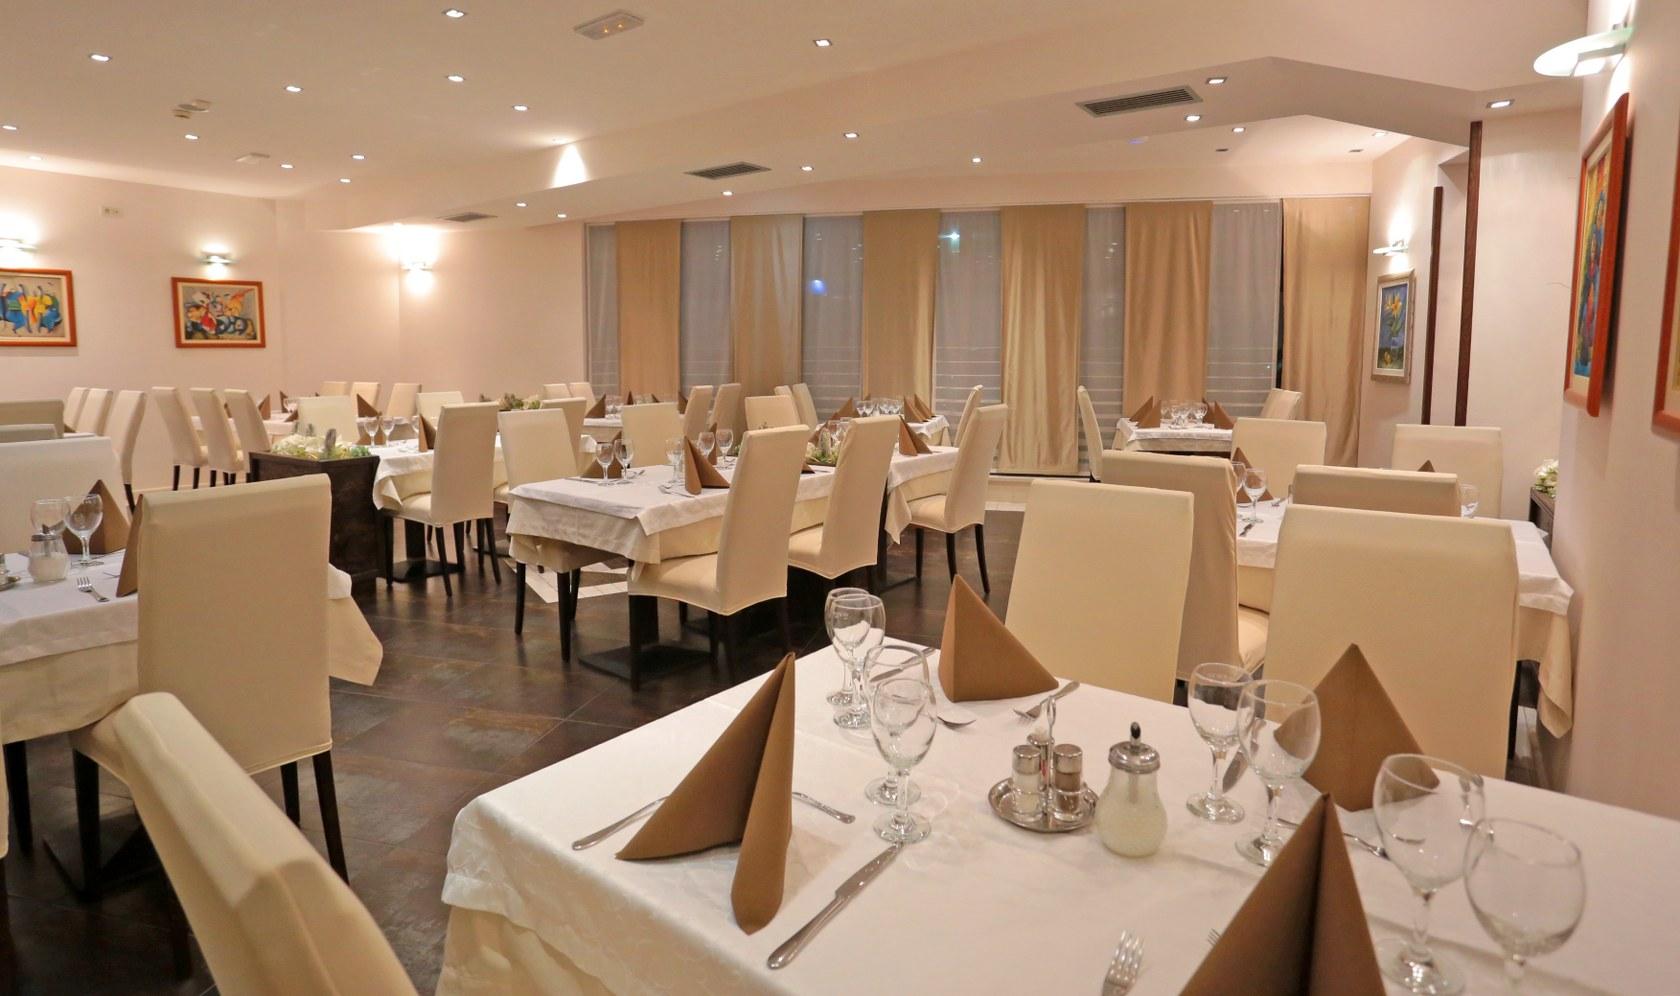 restoran-img_5439.jpg